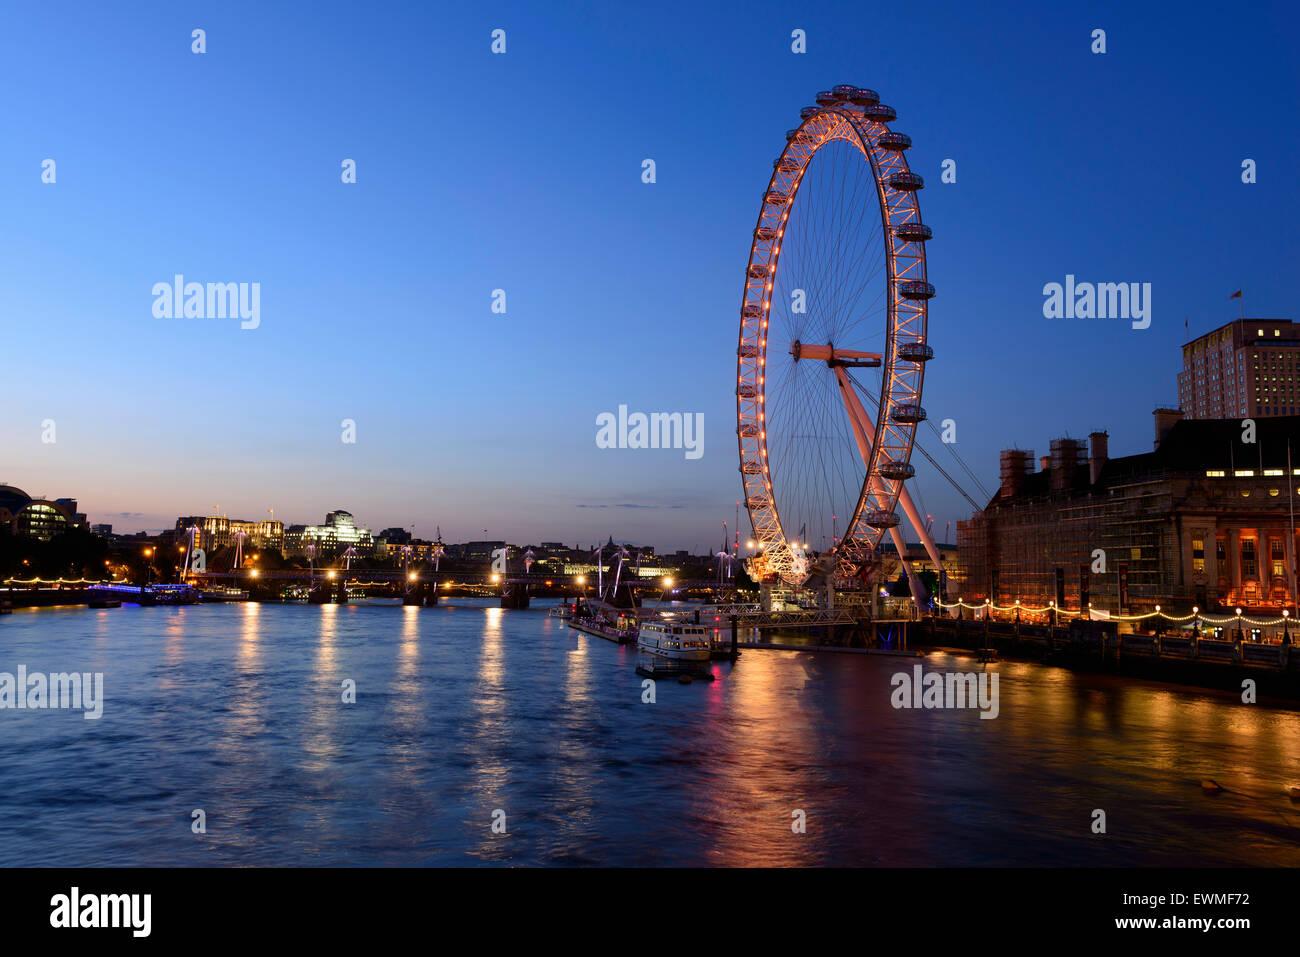 London Eye, Millennium Wheel, London, England, United Kingdom Stock Photo